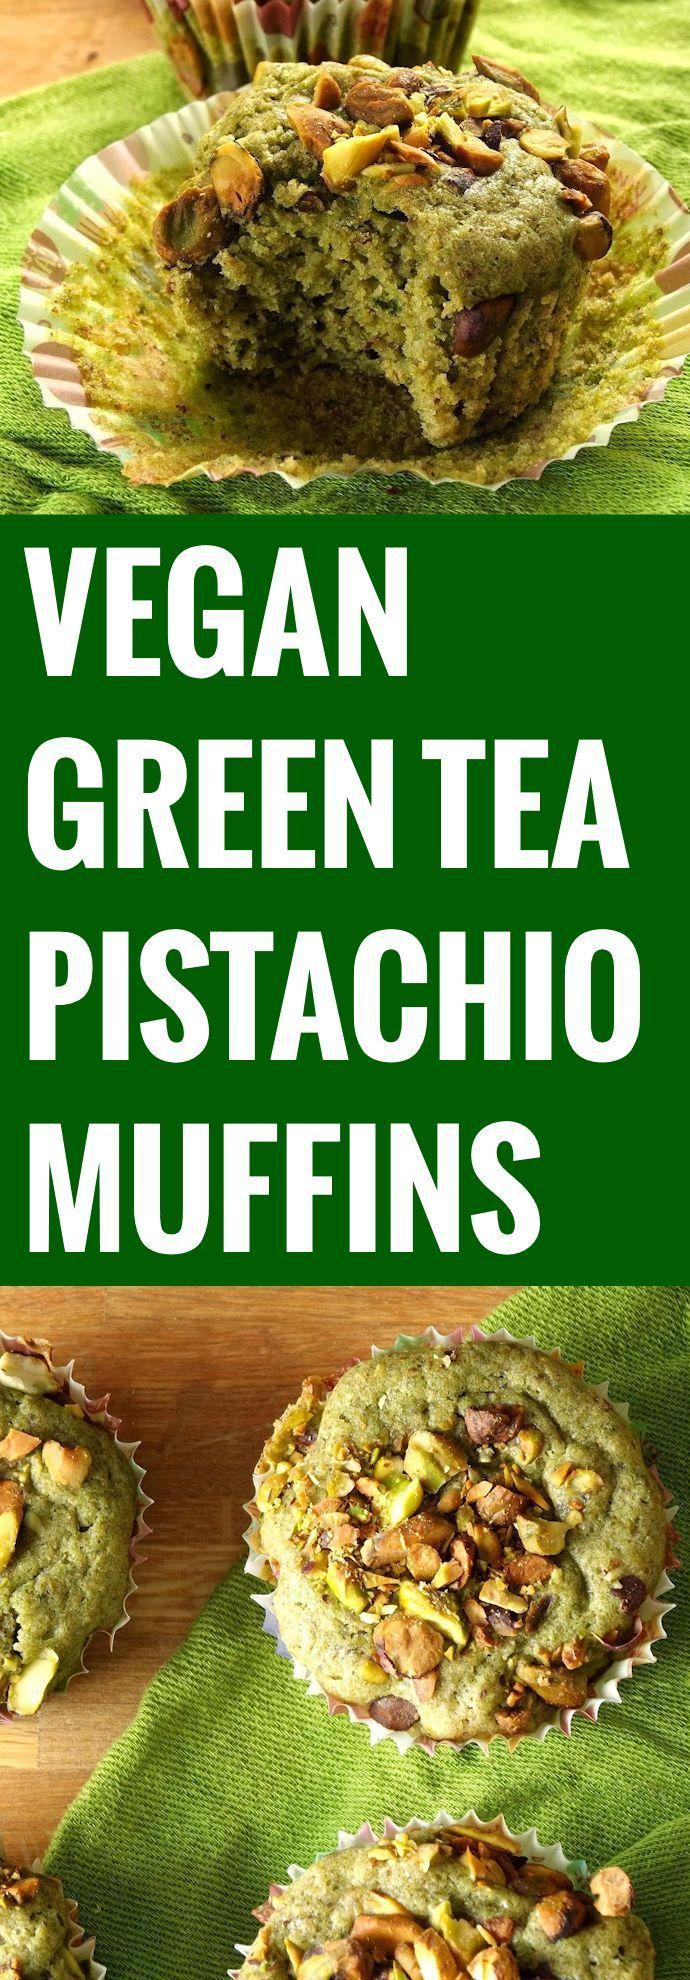 Pistachio Green Tea Muffins: